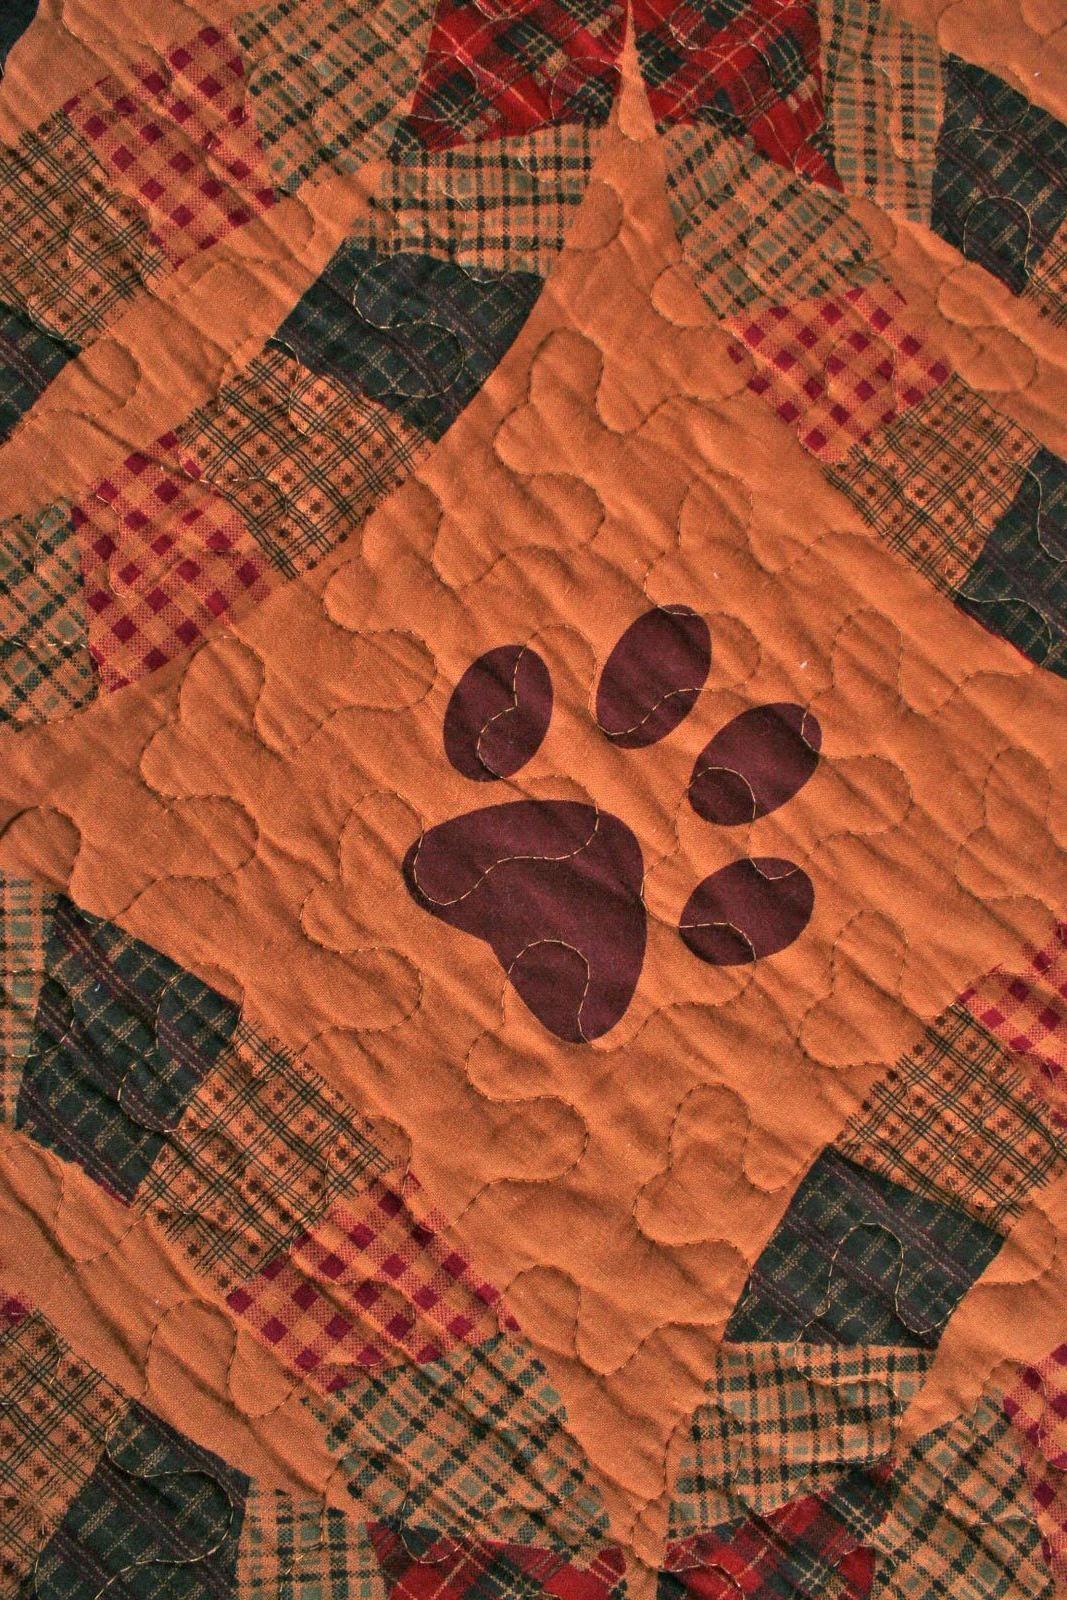 Quilt Black Paw Cabin Life Lap Bedding